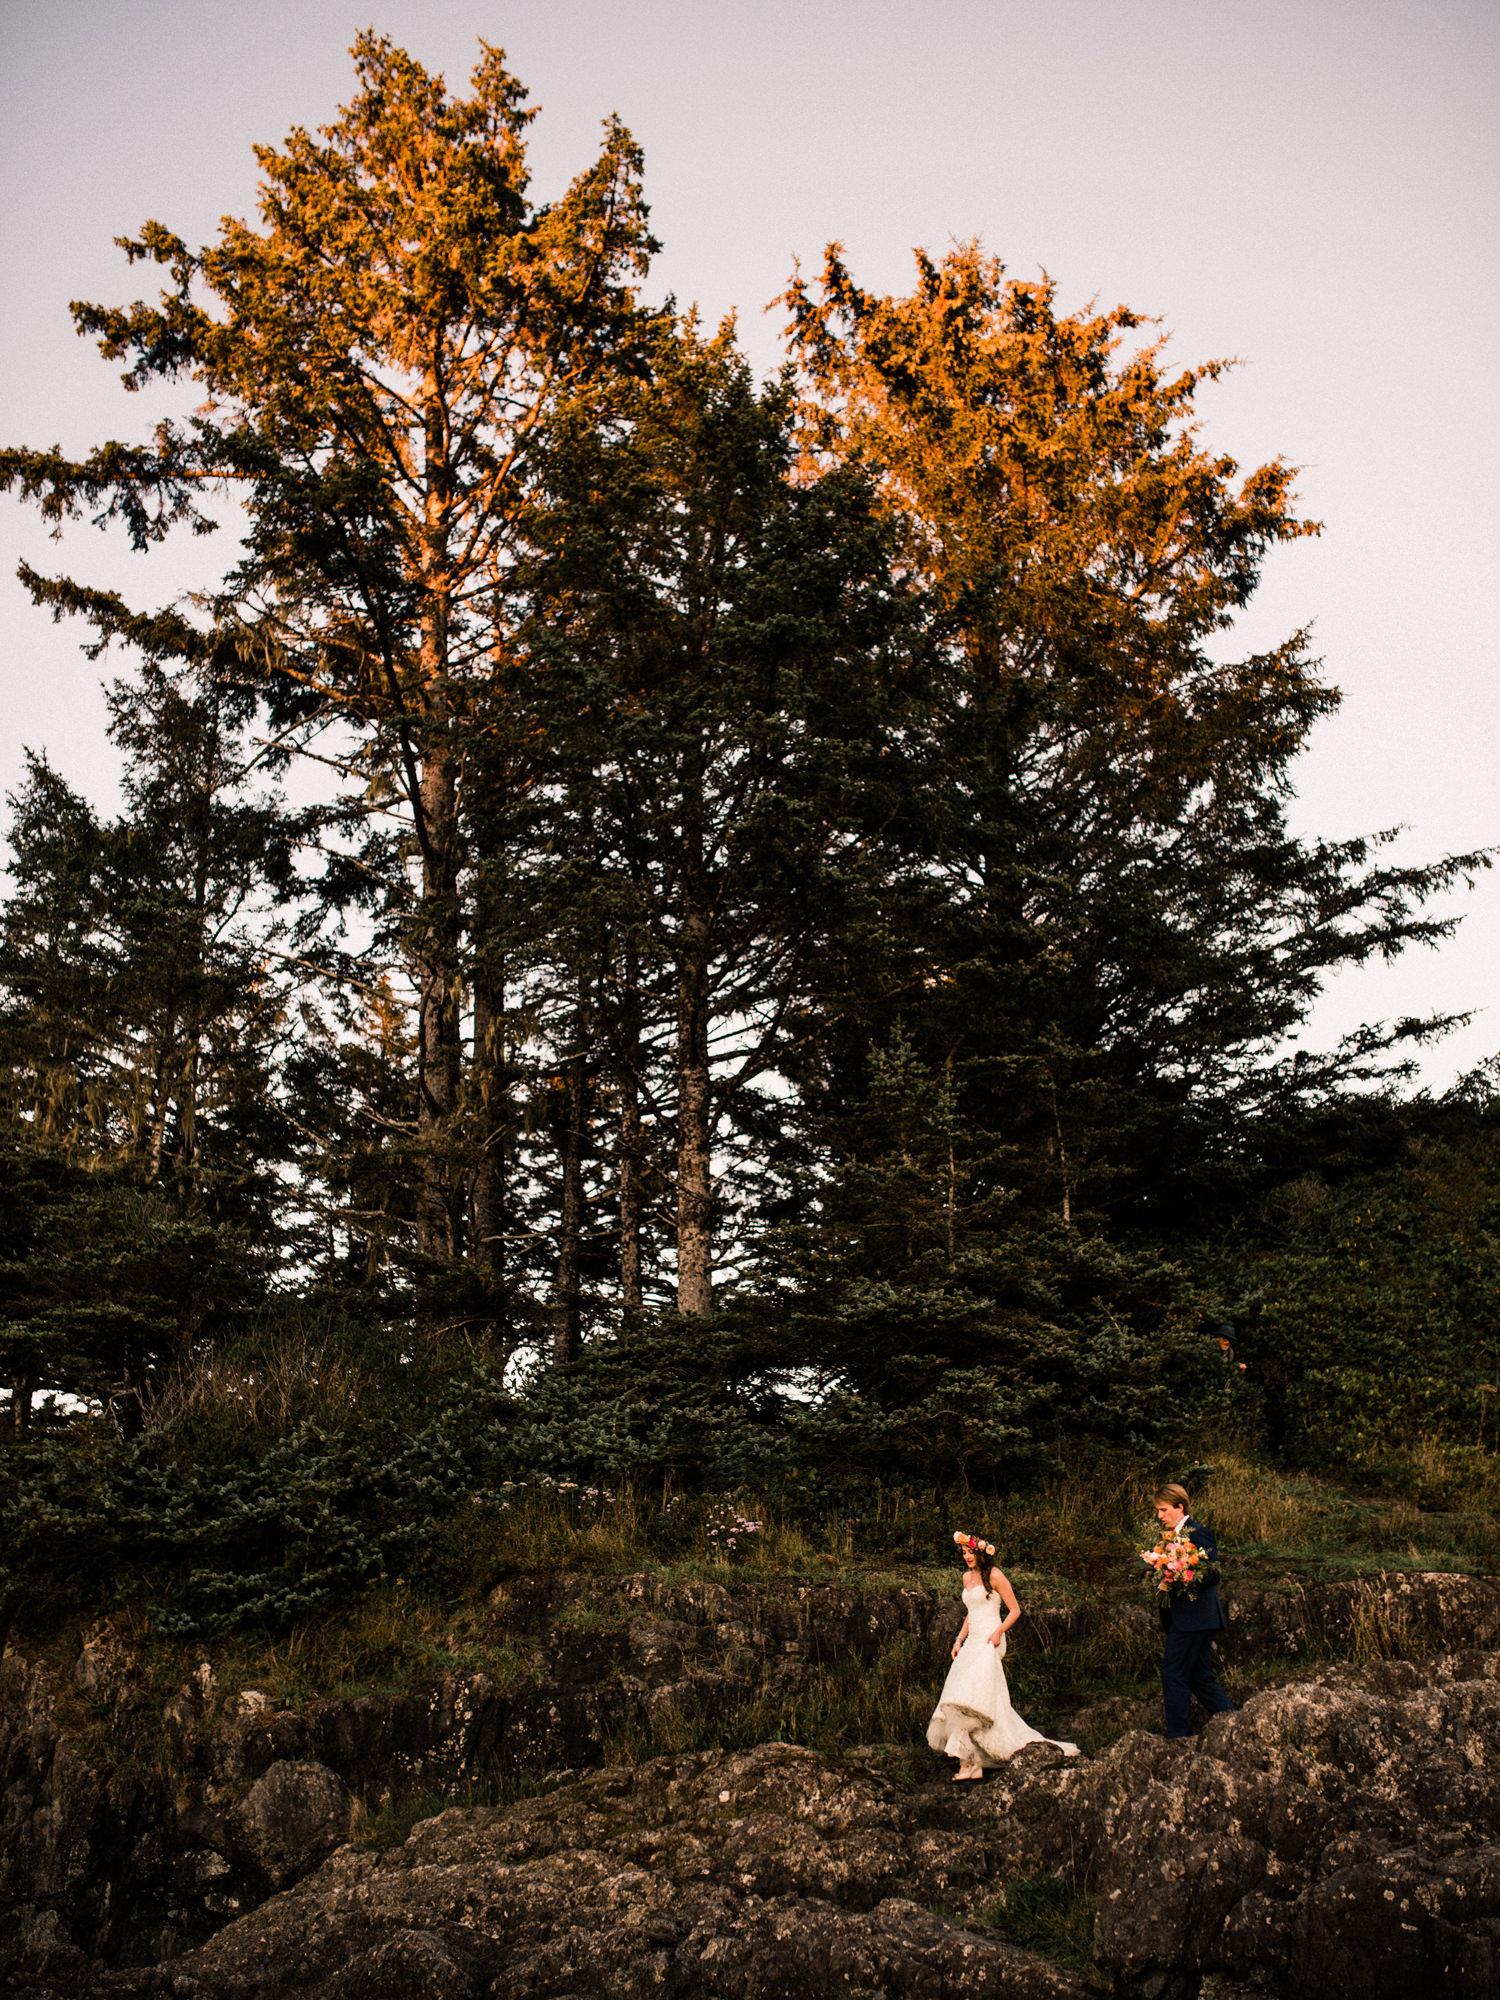 wickaninnish-inn-tofino-bc-elopement-ryan-flynn-photography-00084.JPG